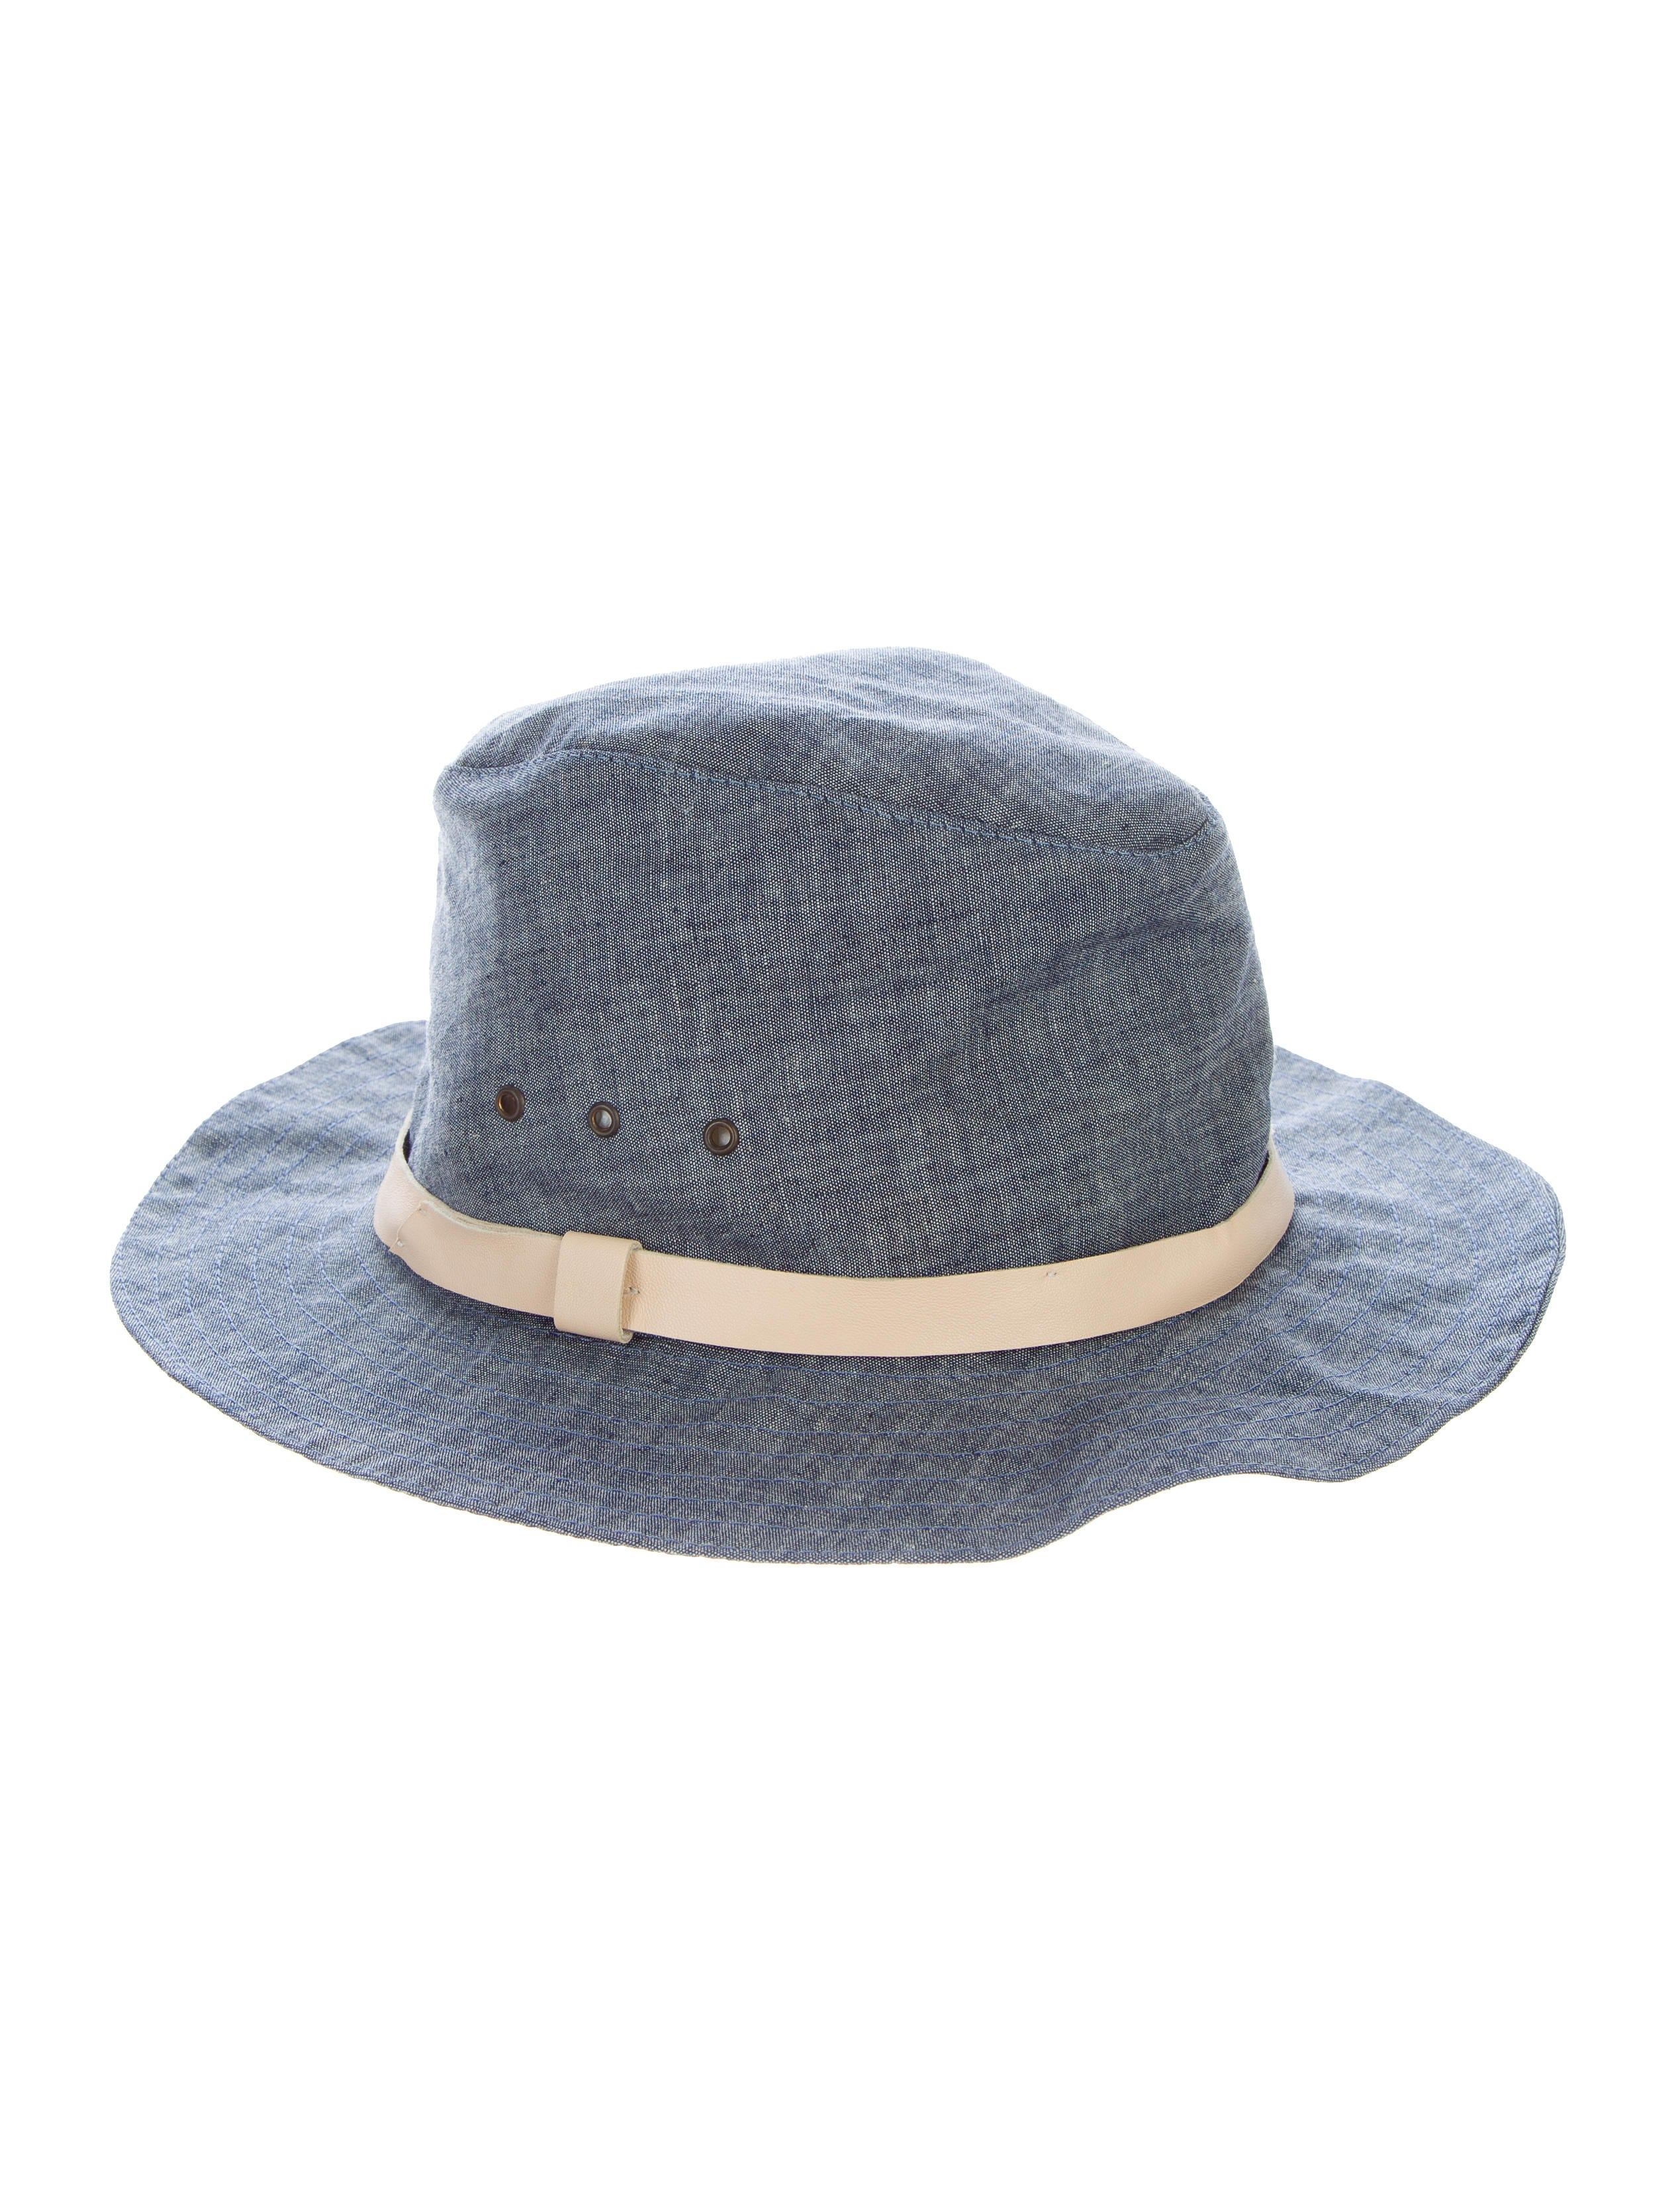 A.P.C. Leather-Trimmed Fedora Hat - Accessories - WA325867  6f328f00973